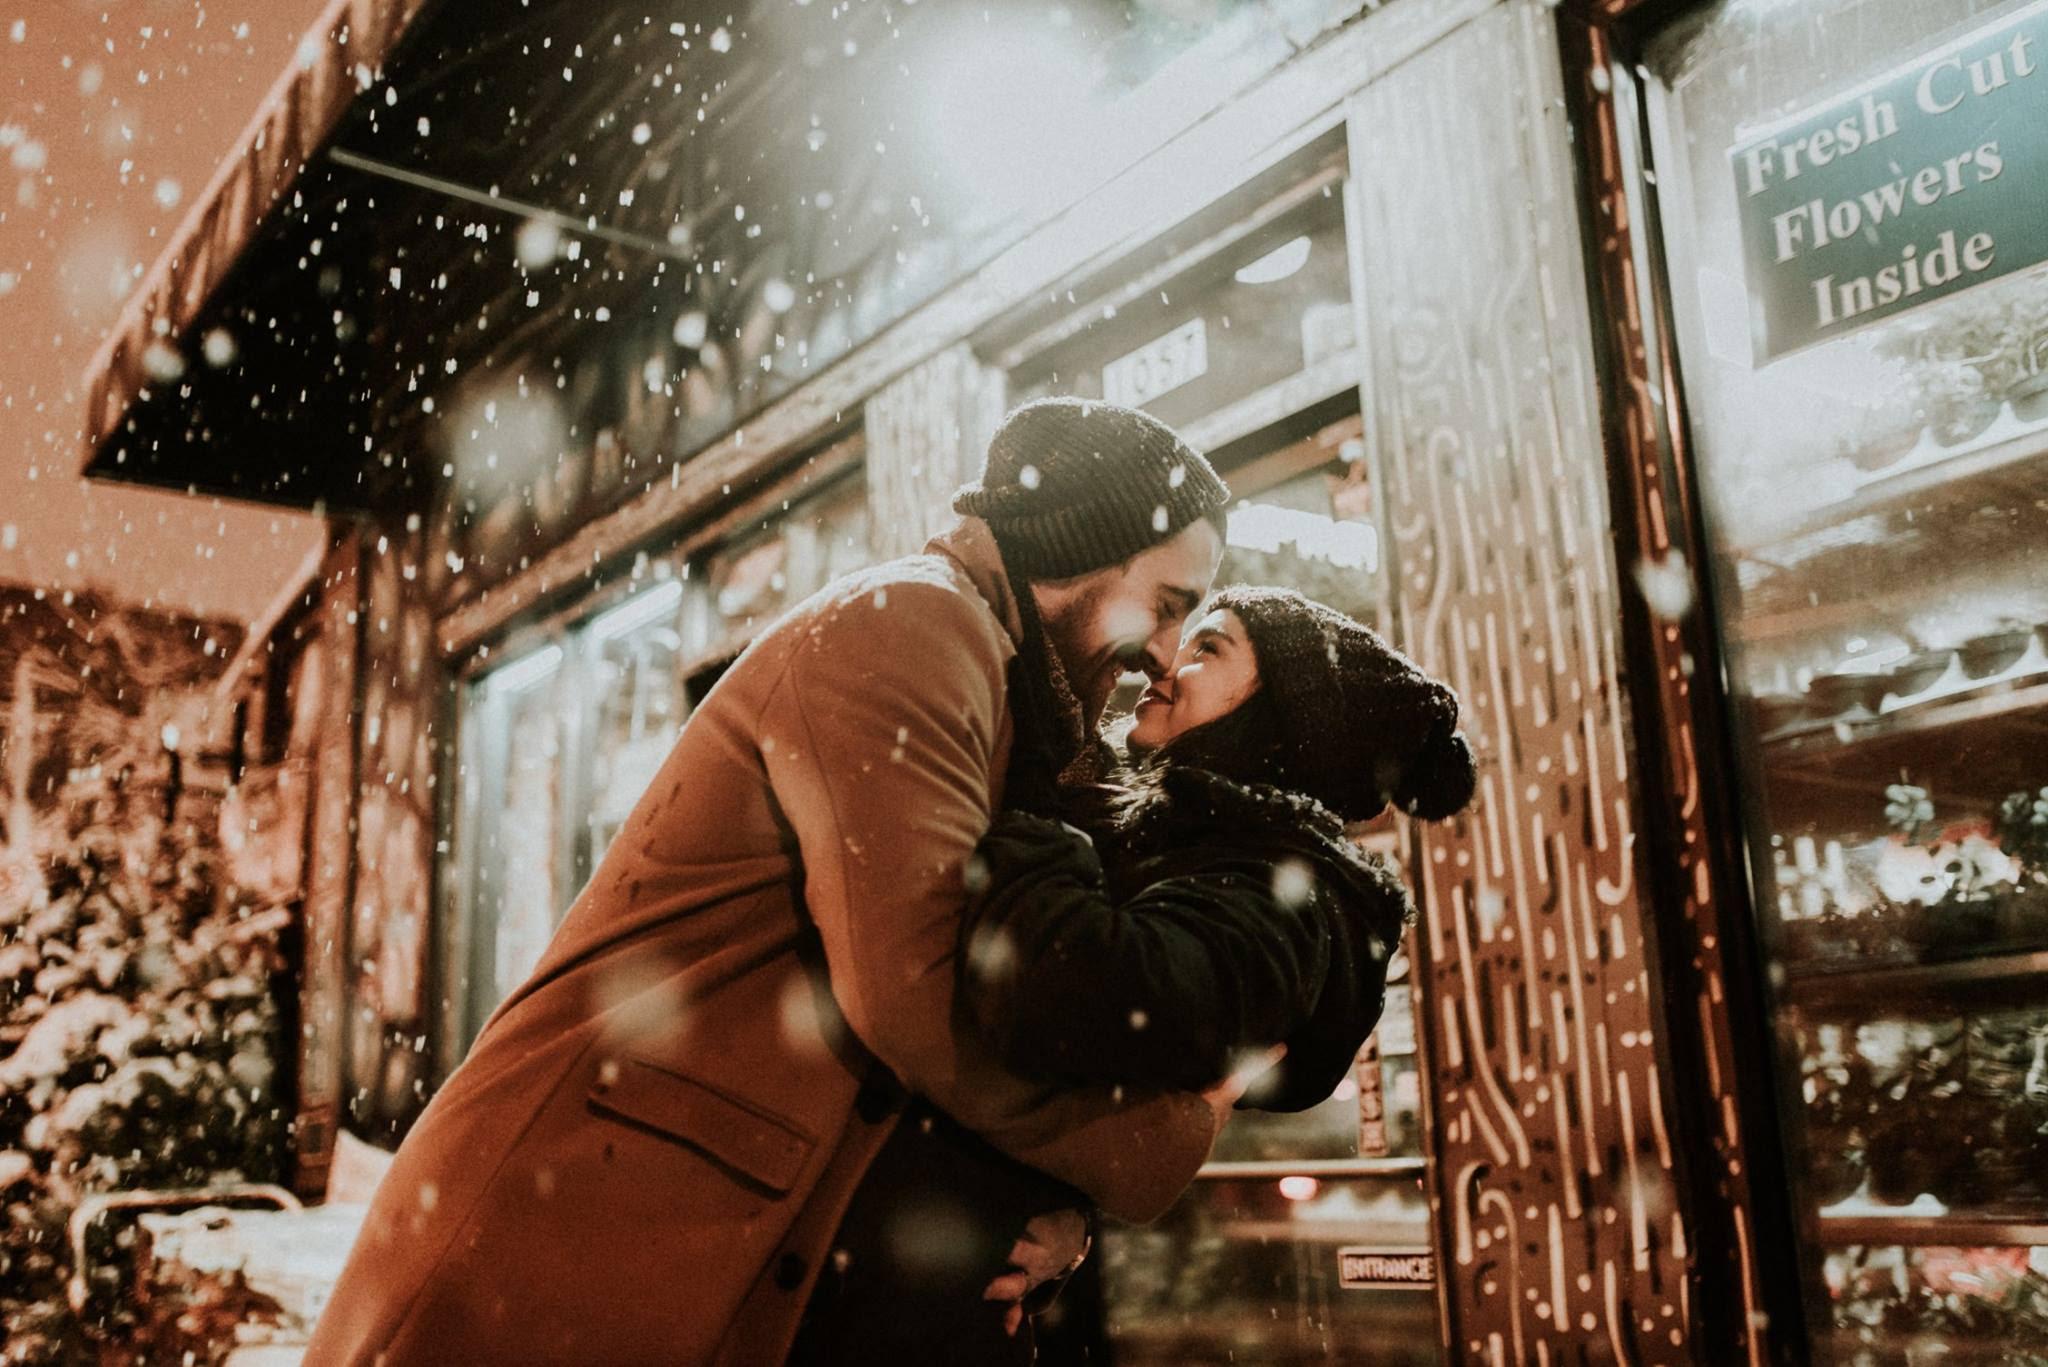 Danny & Jennifer Van Dyke - Snowy Chicago Couples Portraits -1.4k Likes